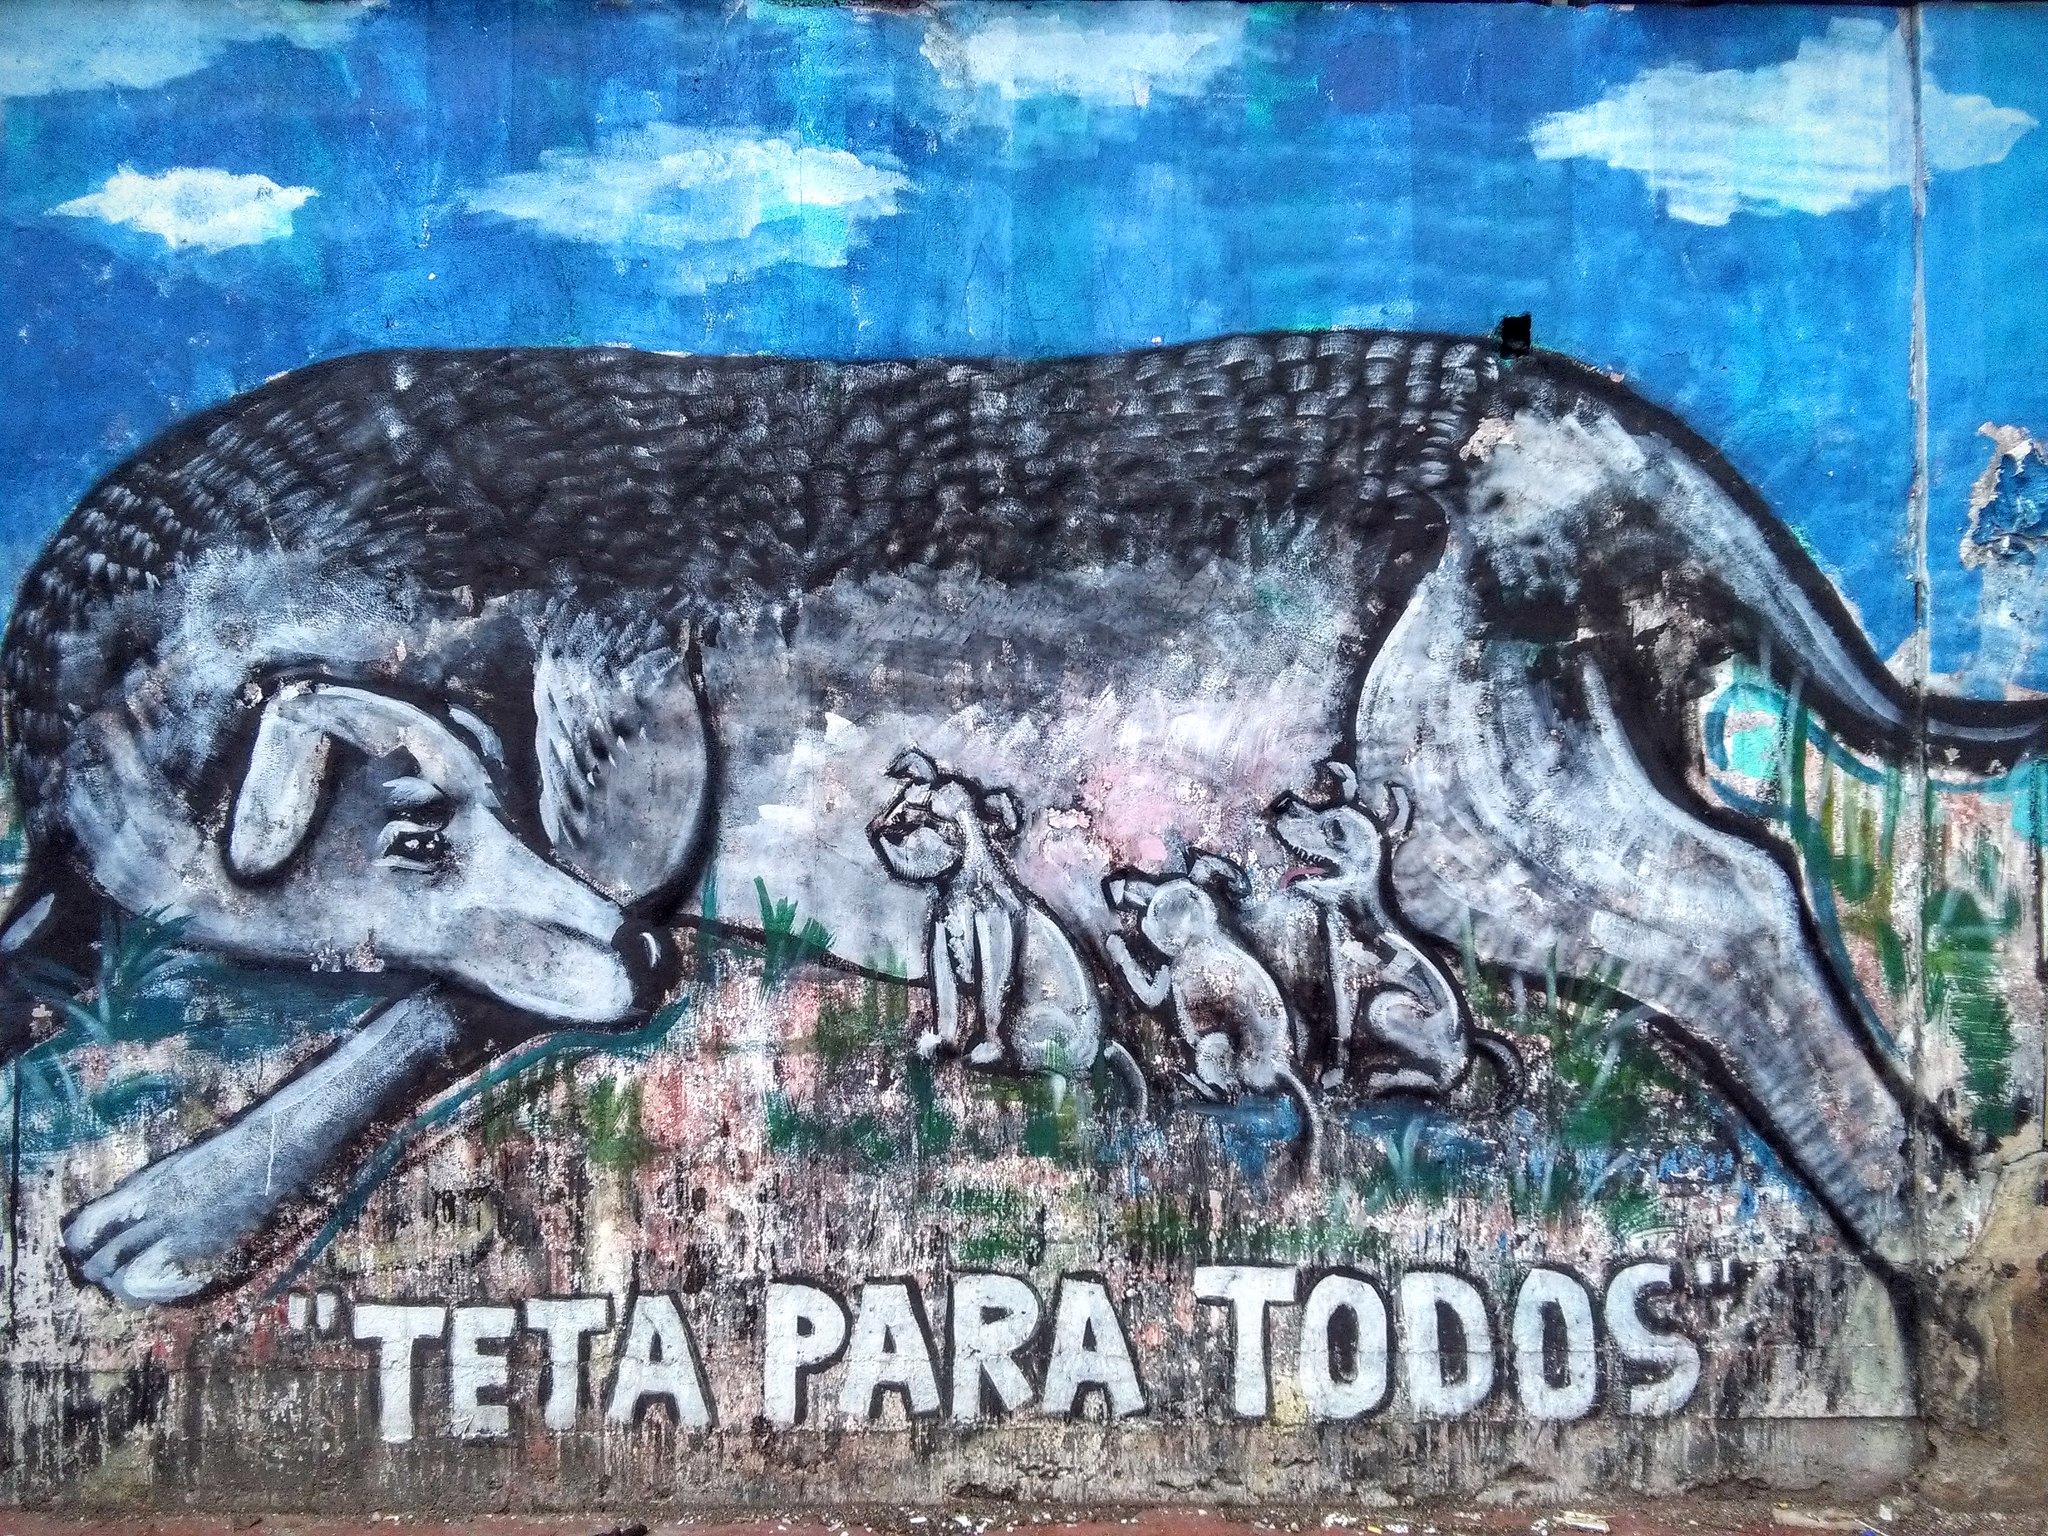 Street art in Córdoba